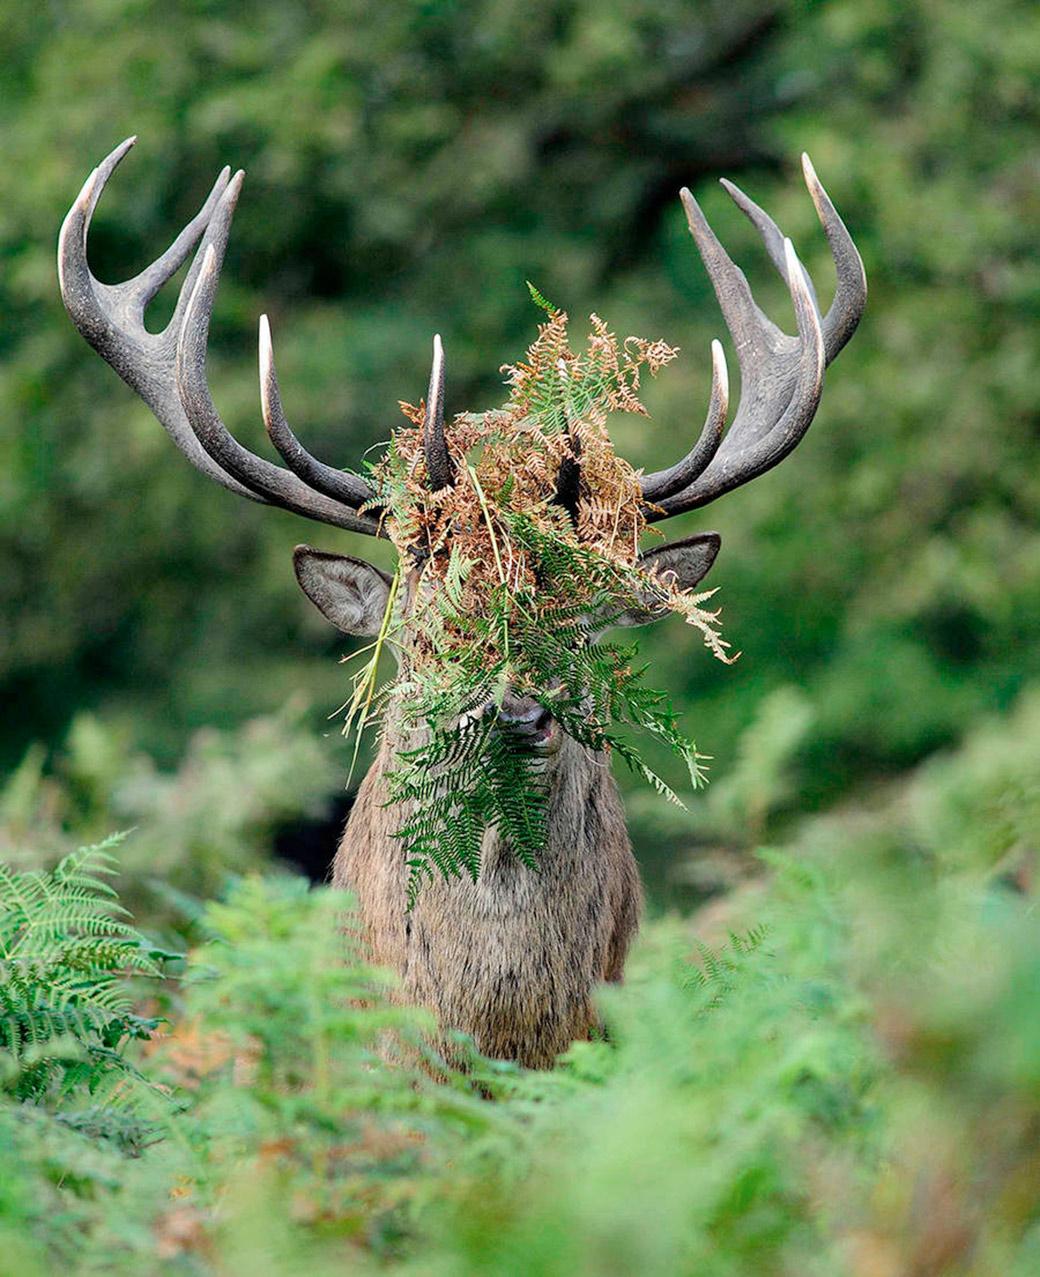 "<a href=""http://comedywildlifephoto.com/"" target=""_blank"">Comedy Wildlife Photography Awards</a>"